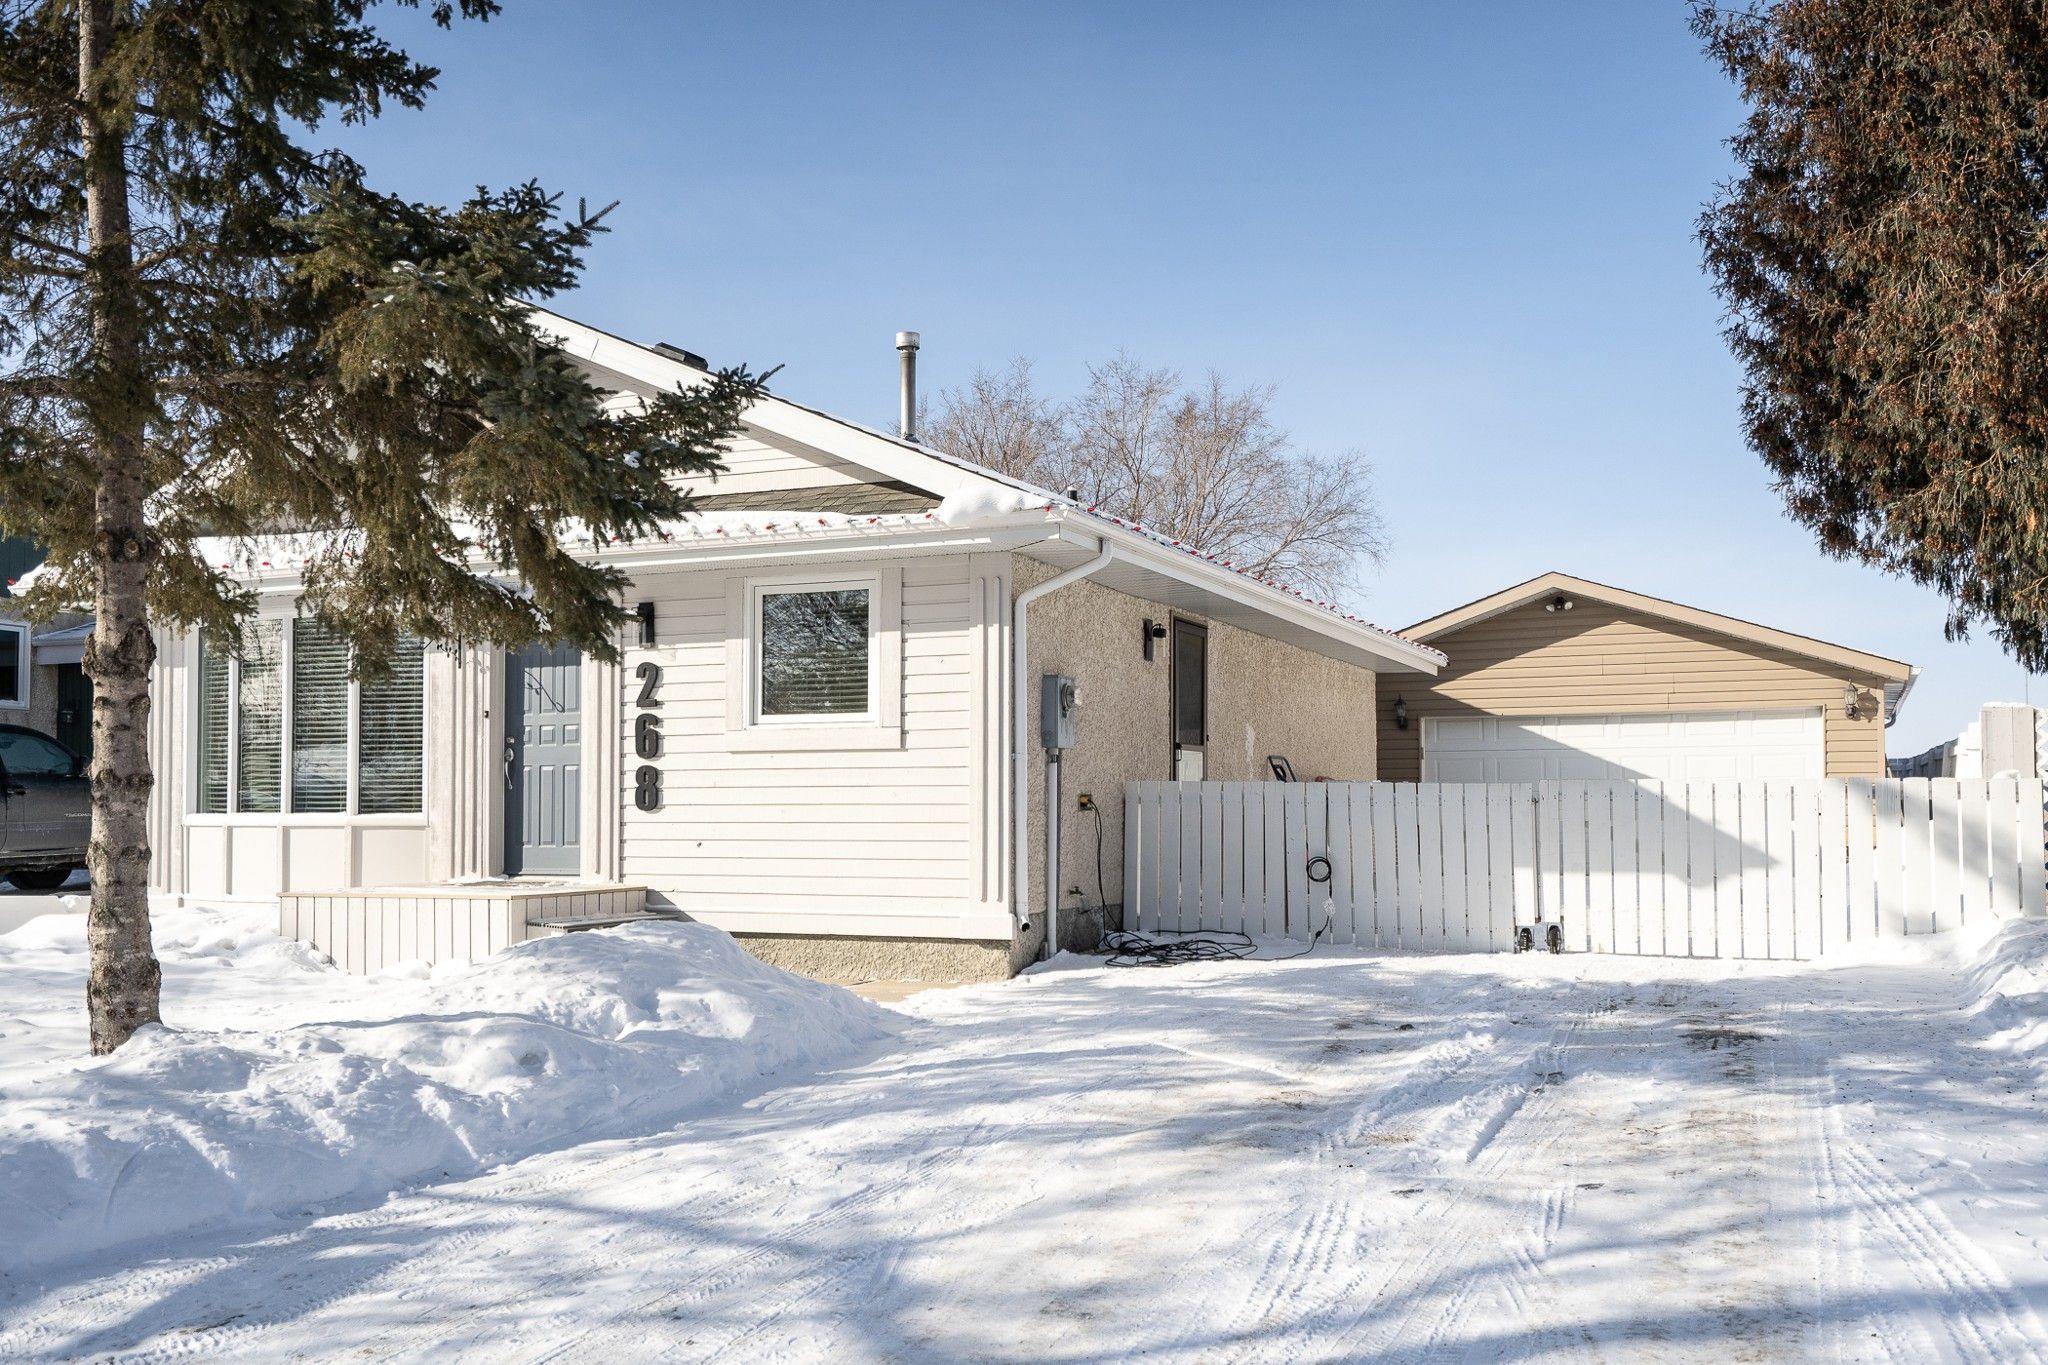 Main Photo: 268 Alex Taylor Drive in Winnipeg: Canterbury Park House for sale (3M)  : MLS®# 202102934